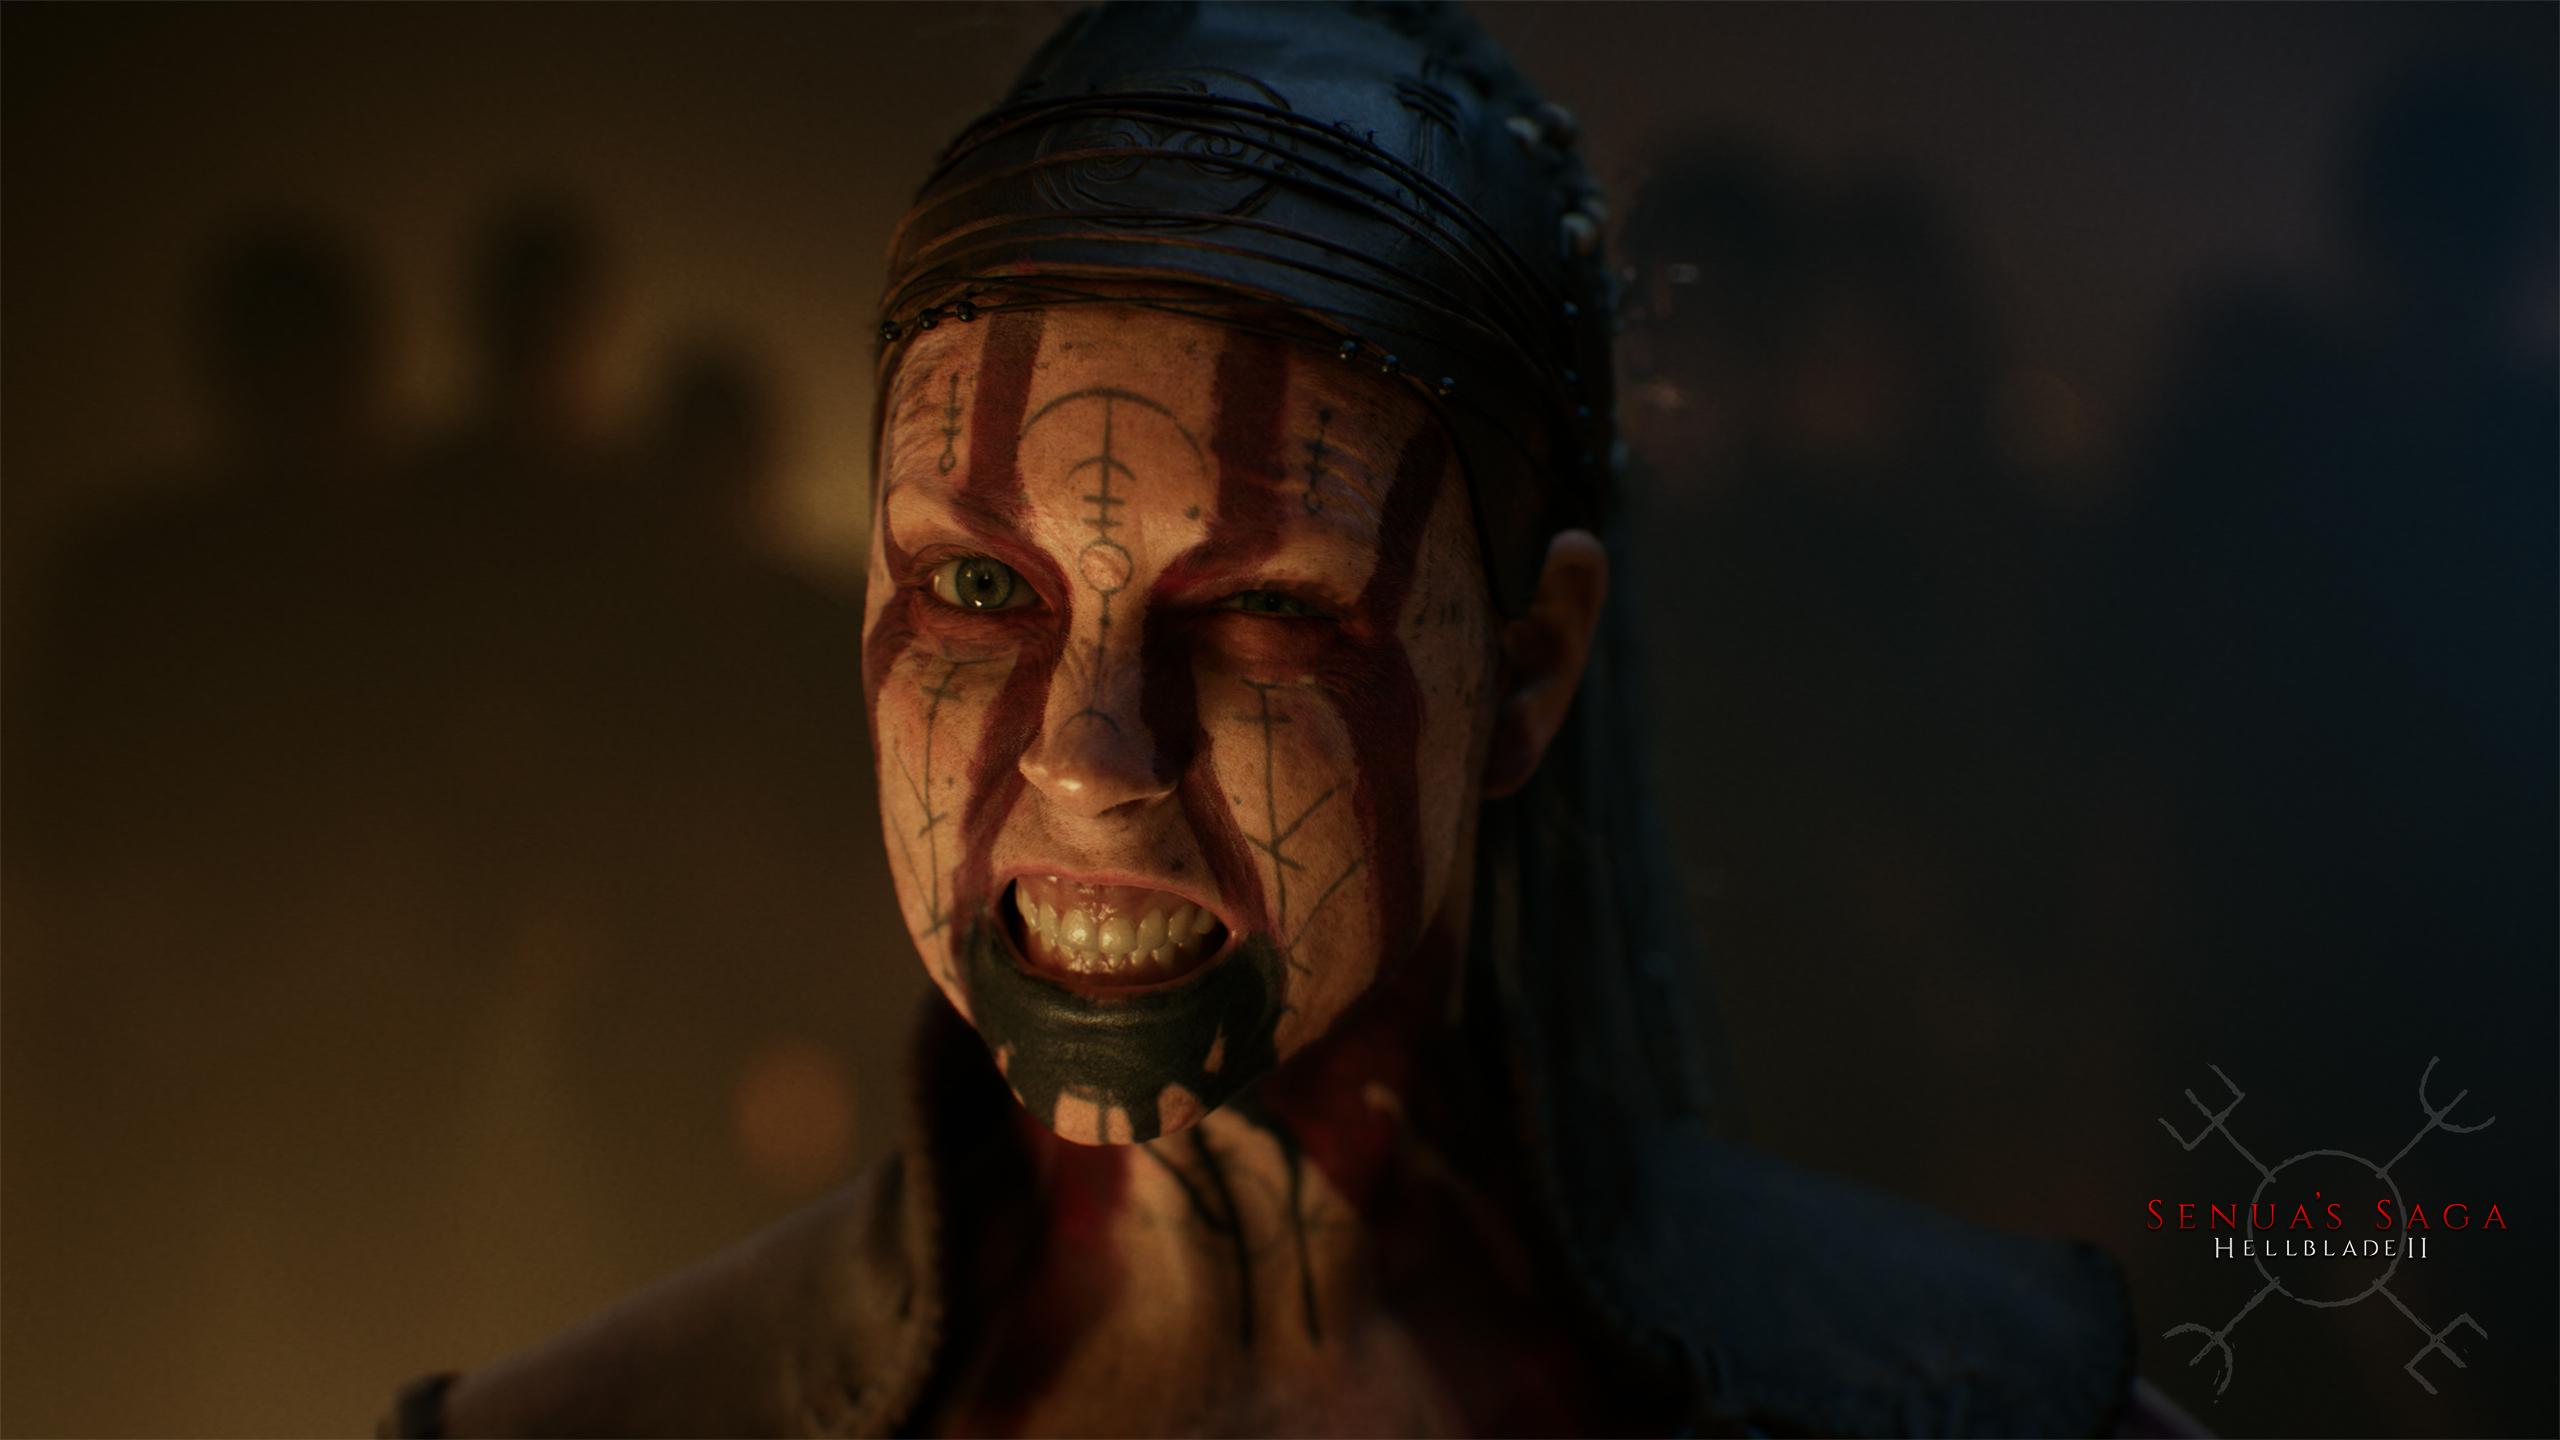 video games Video Game Art video game girls Vikings Norse mythology dark Senua Hellblade Senua's Sacrifice Senua's Saga Hellbalde II 1855449